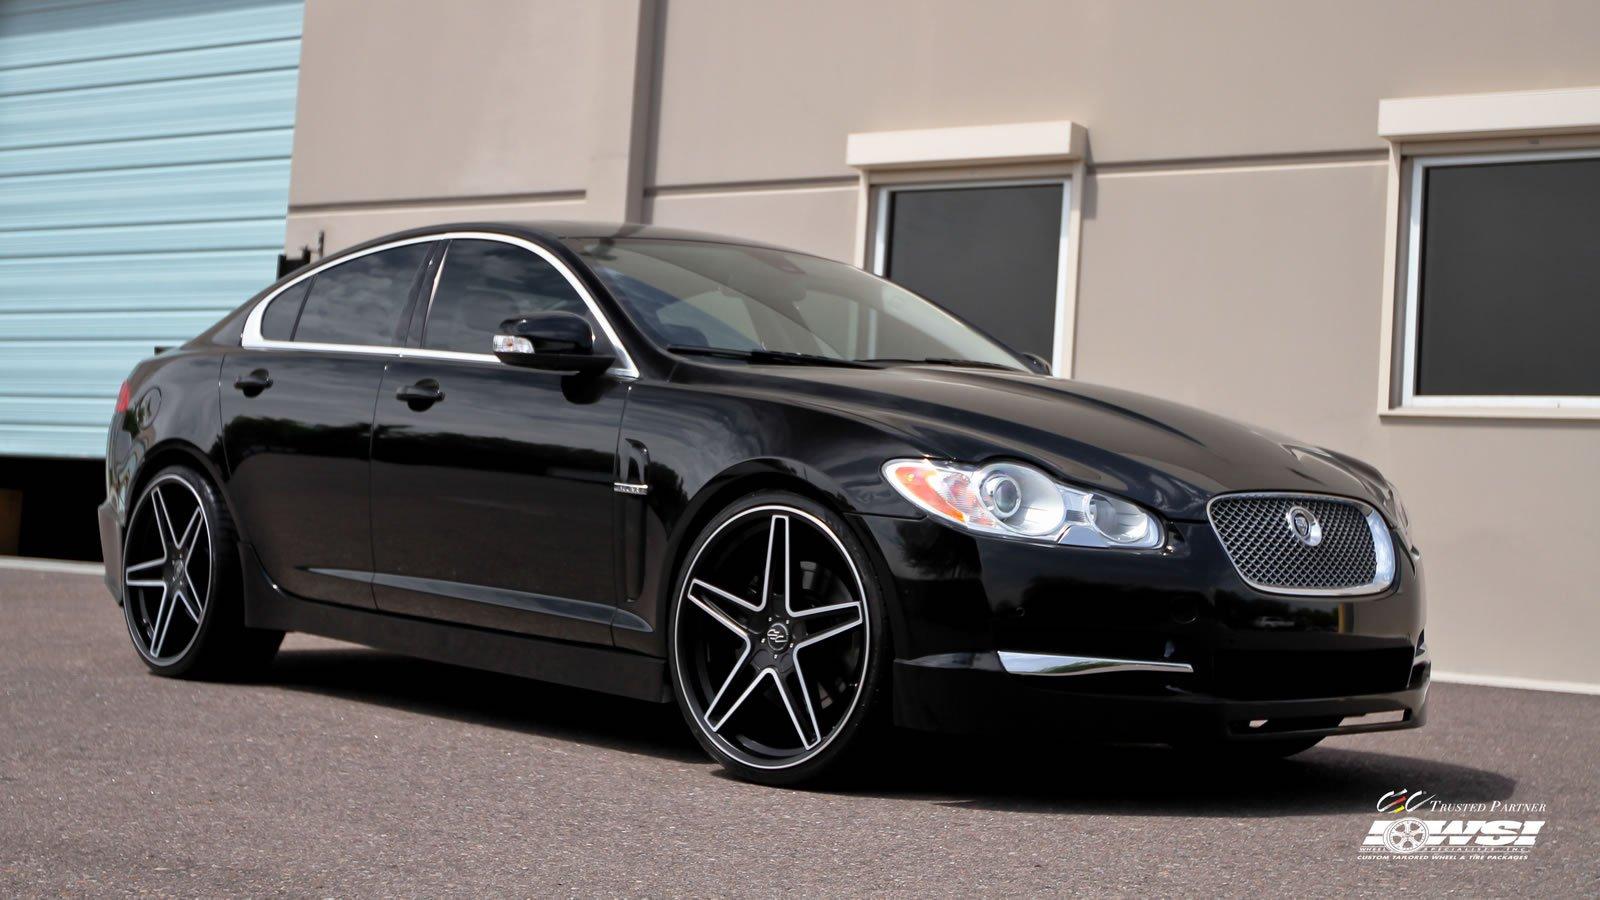 2015 cars cec jaguar xf sedan tuning wheels wallpaper 1600x900 625513 wallpaperup. Black Bedroom Furniture Sets. Home Design Ideas